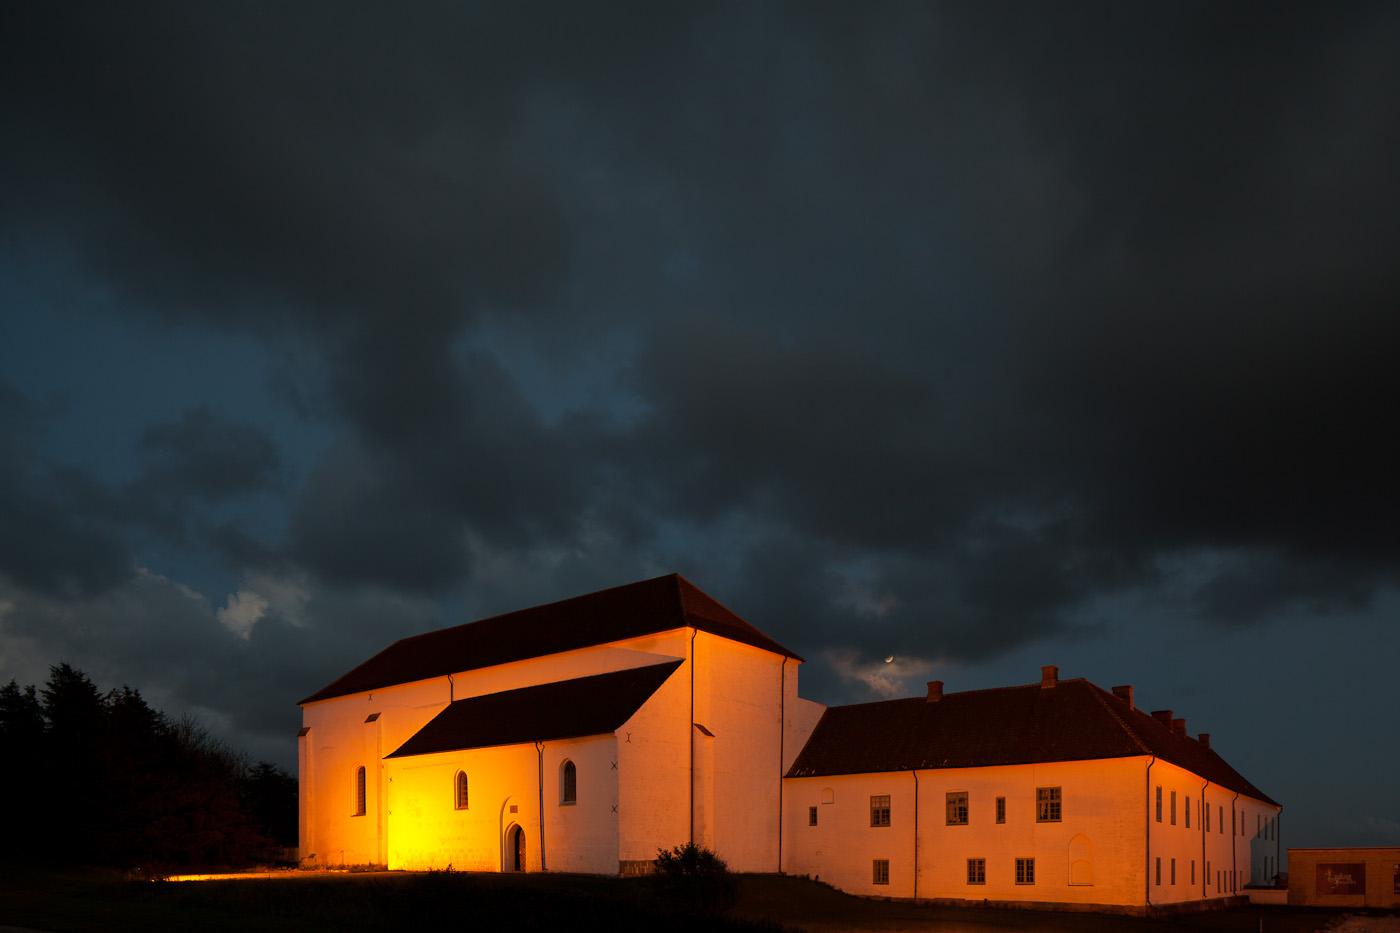 Børglum Kloster